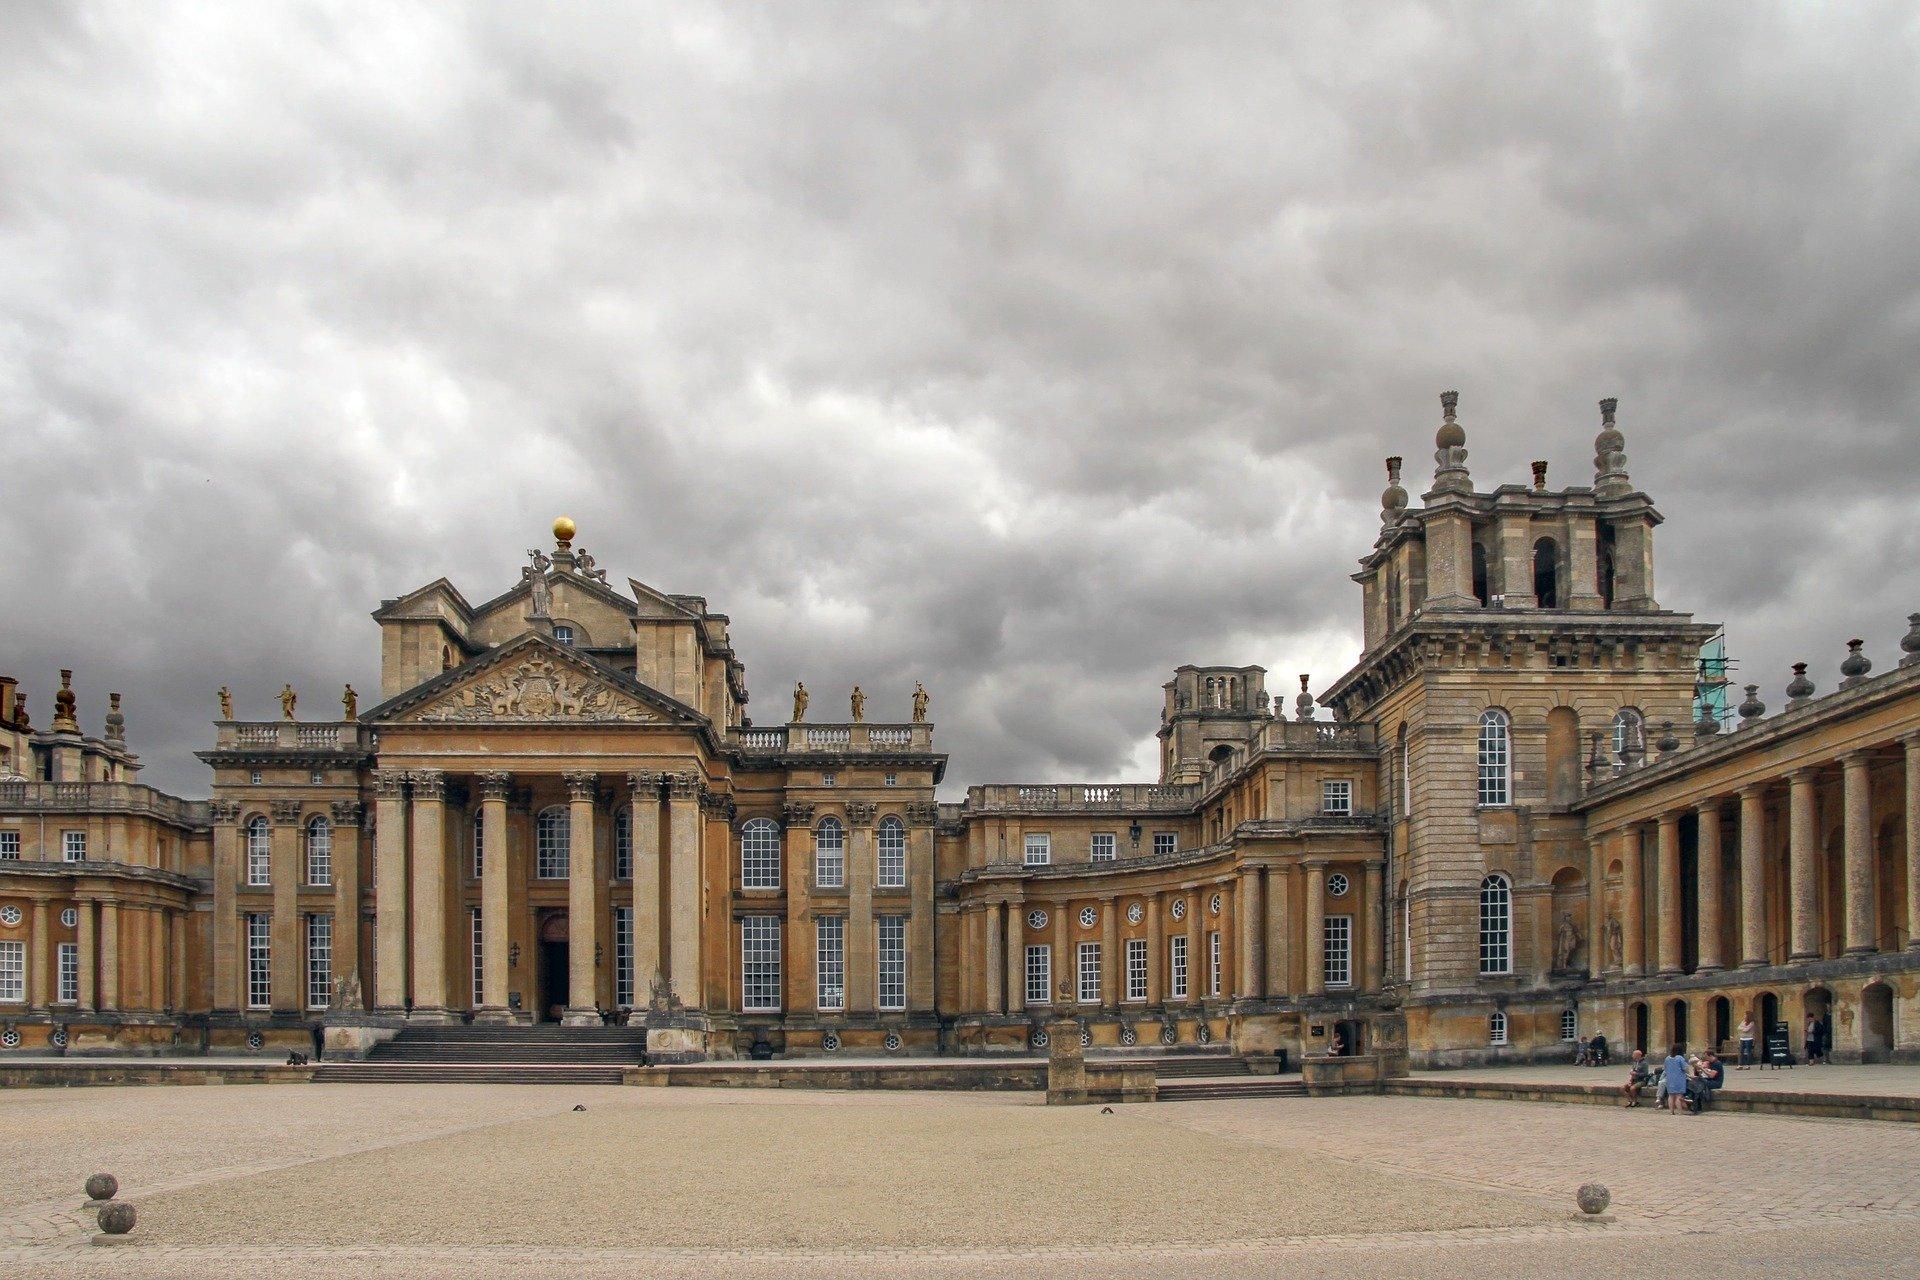 Blenheim Palace Tours